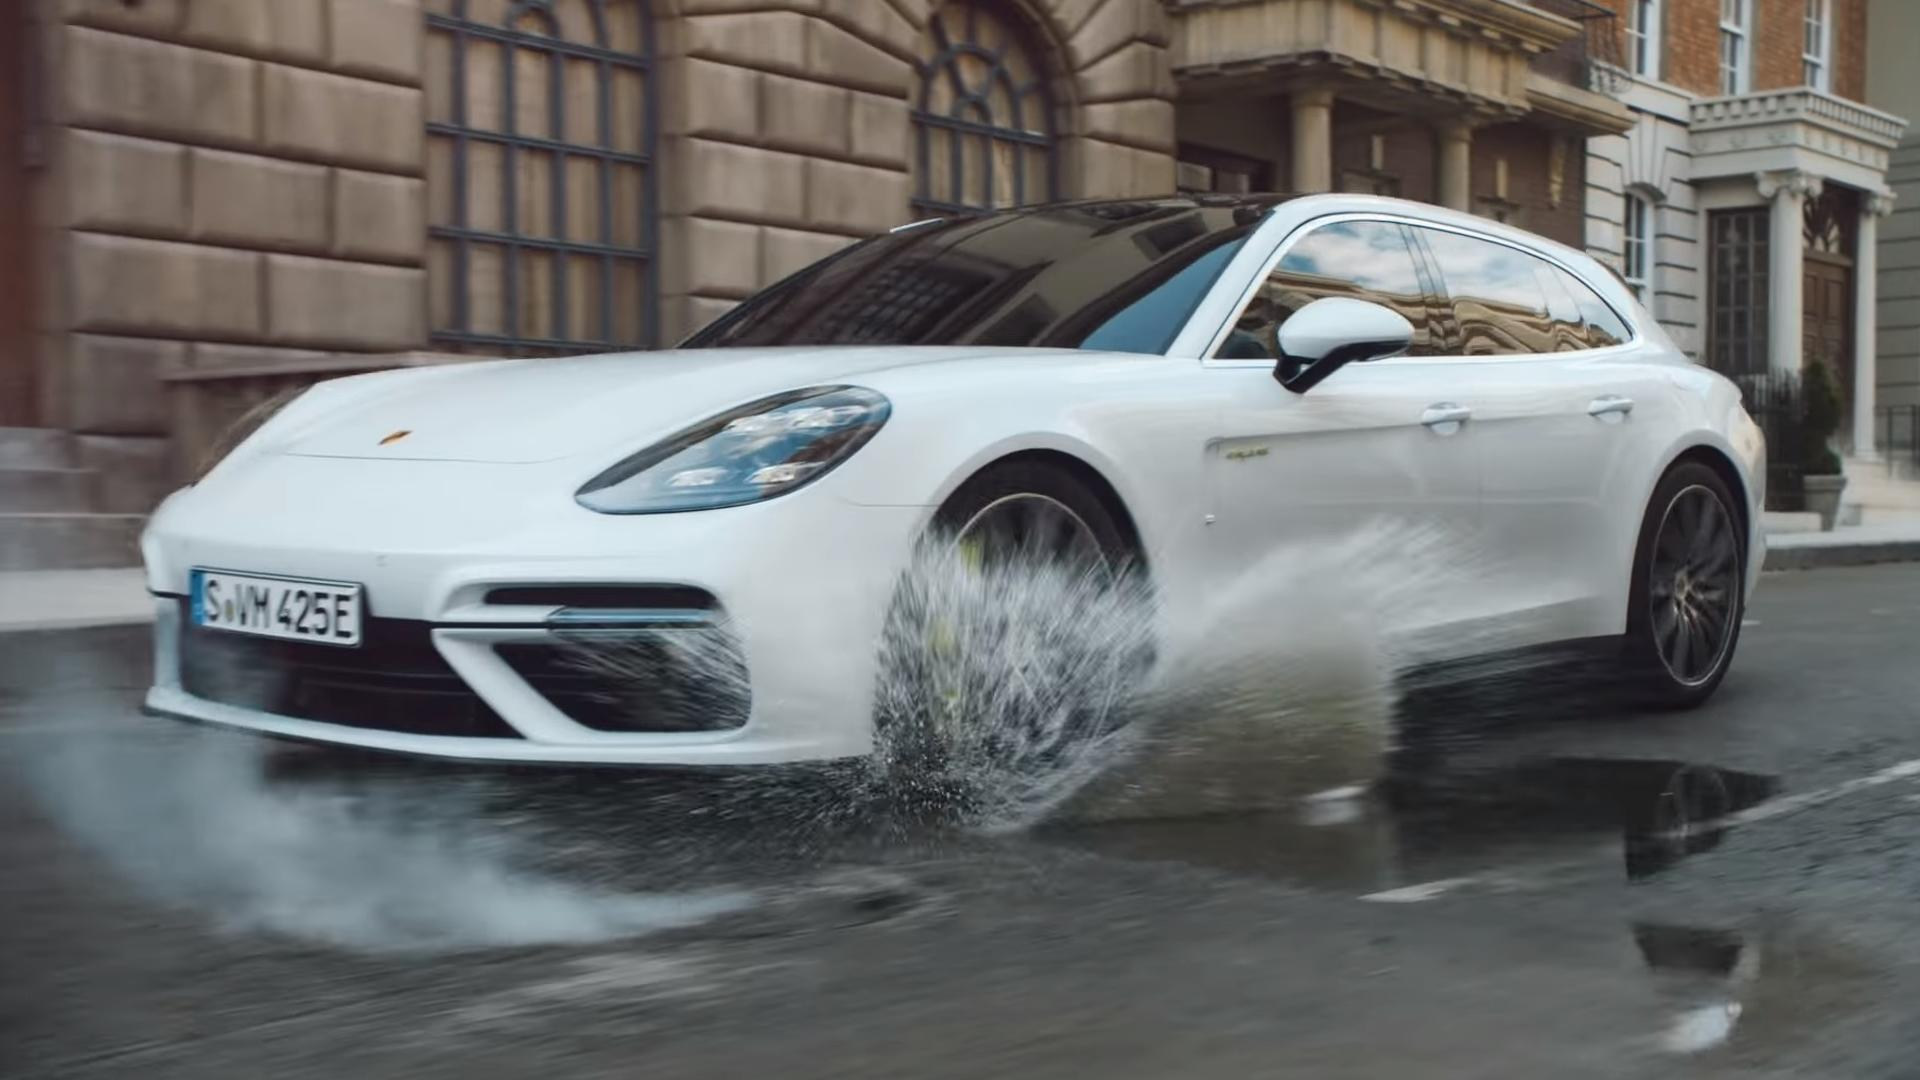 Porsche Panamera Turbo S E Hybrid Sport Turismo Makes Video Debut